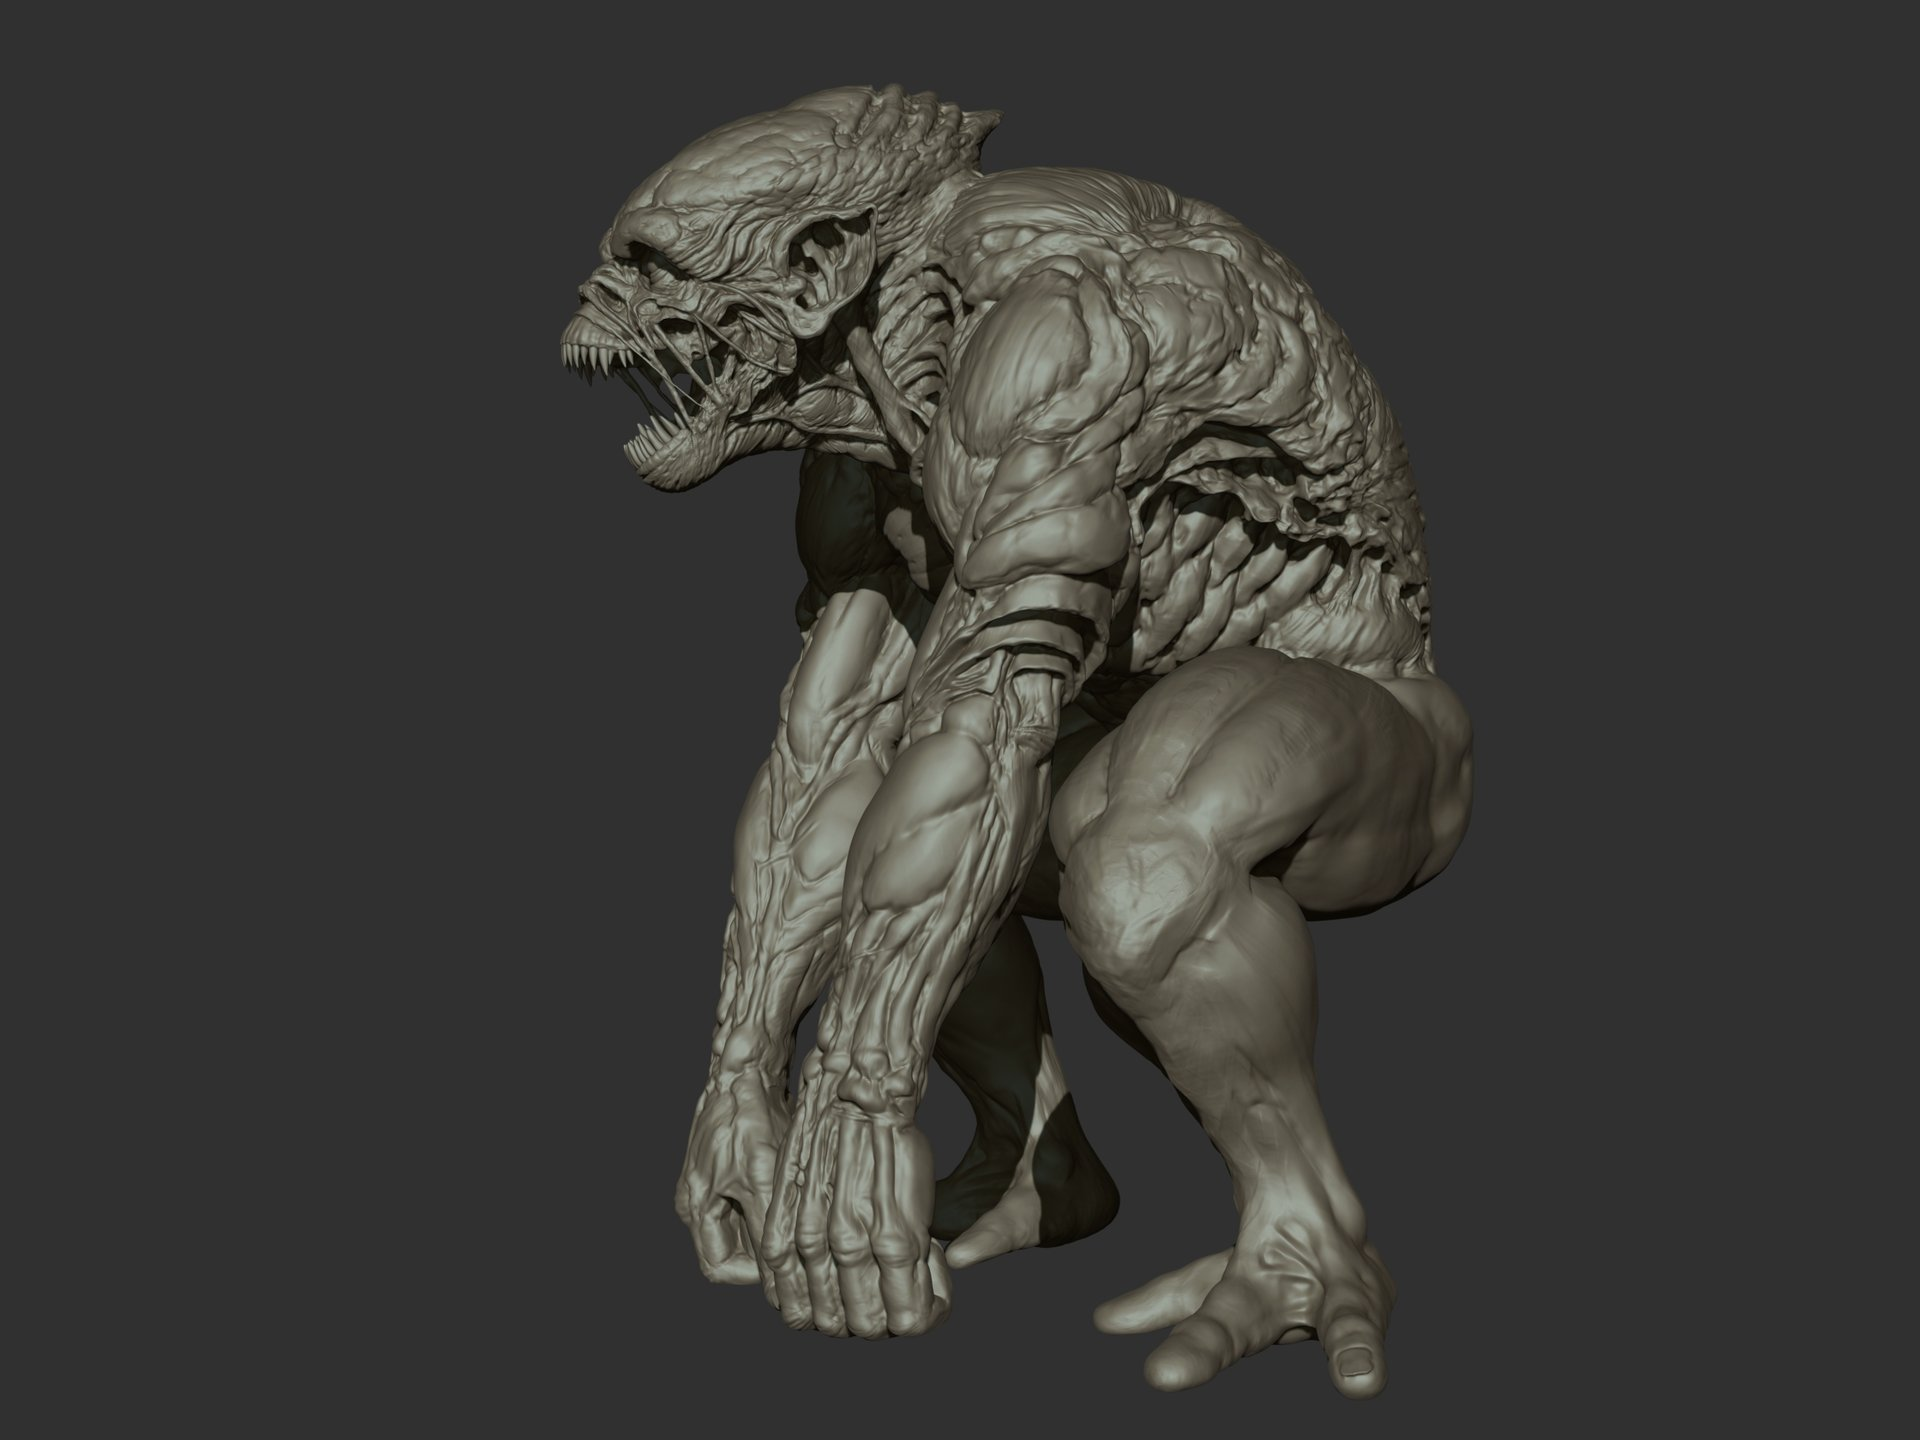 Ganesh poojari monster 002